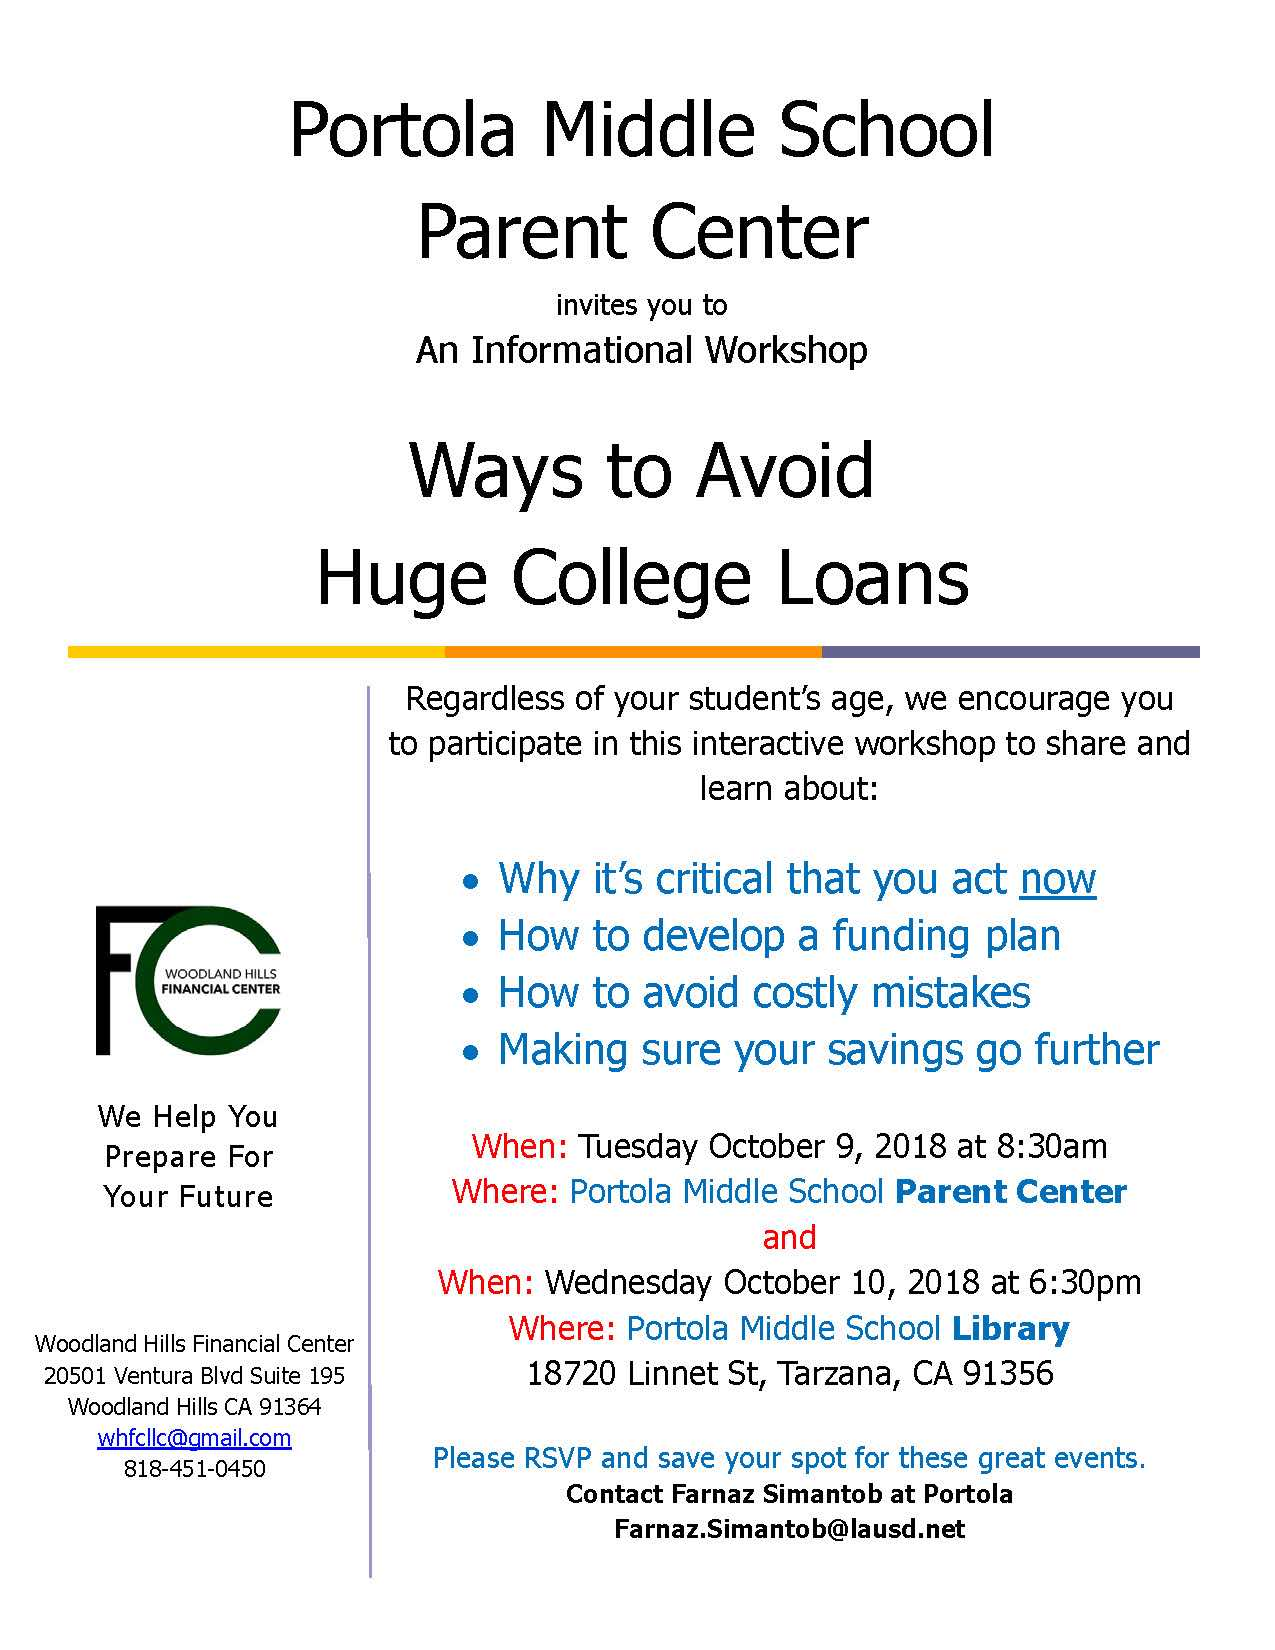 Ways to Avoid Huge College Loans - An Informational Workshop